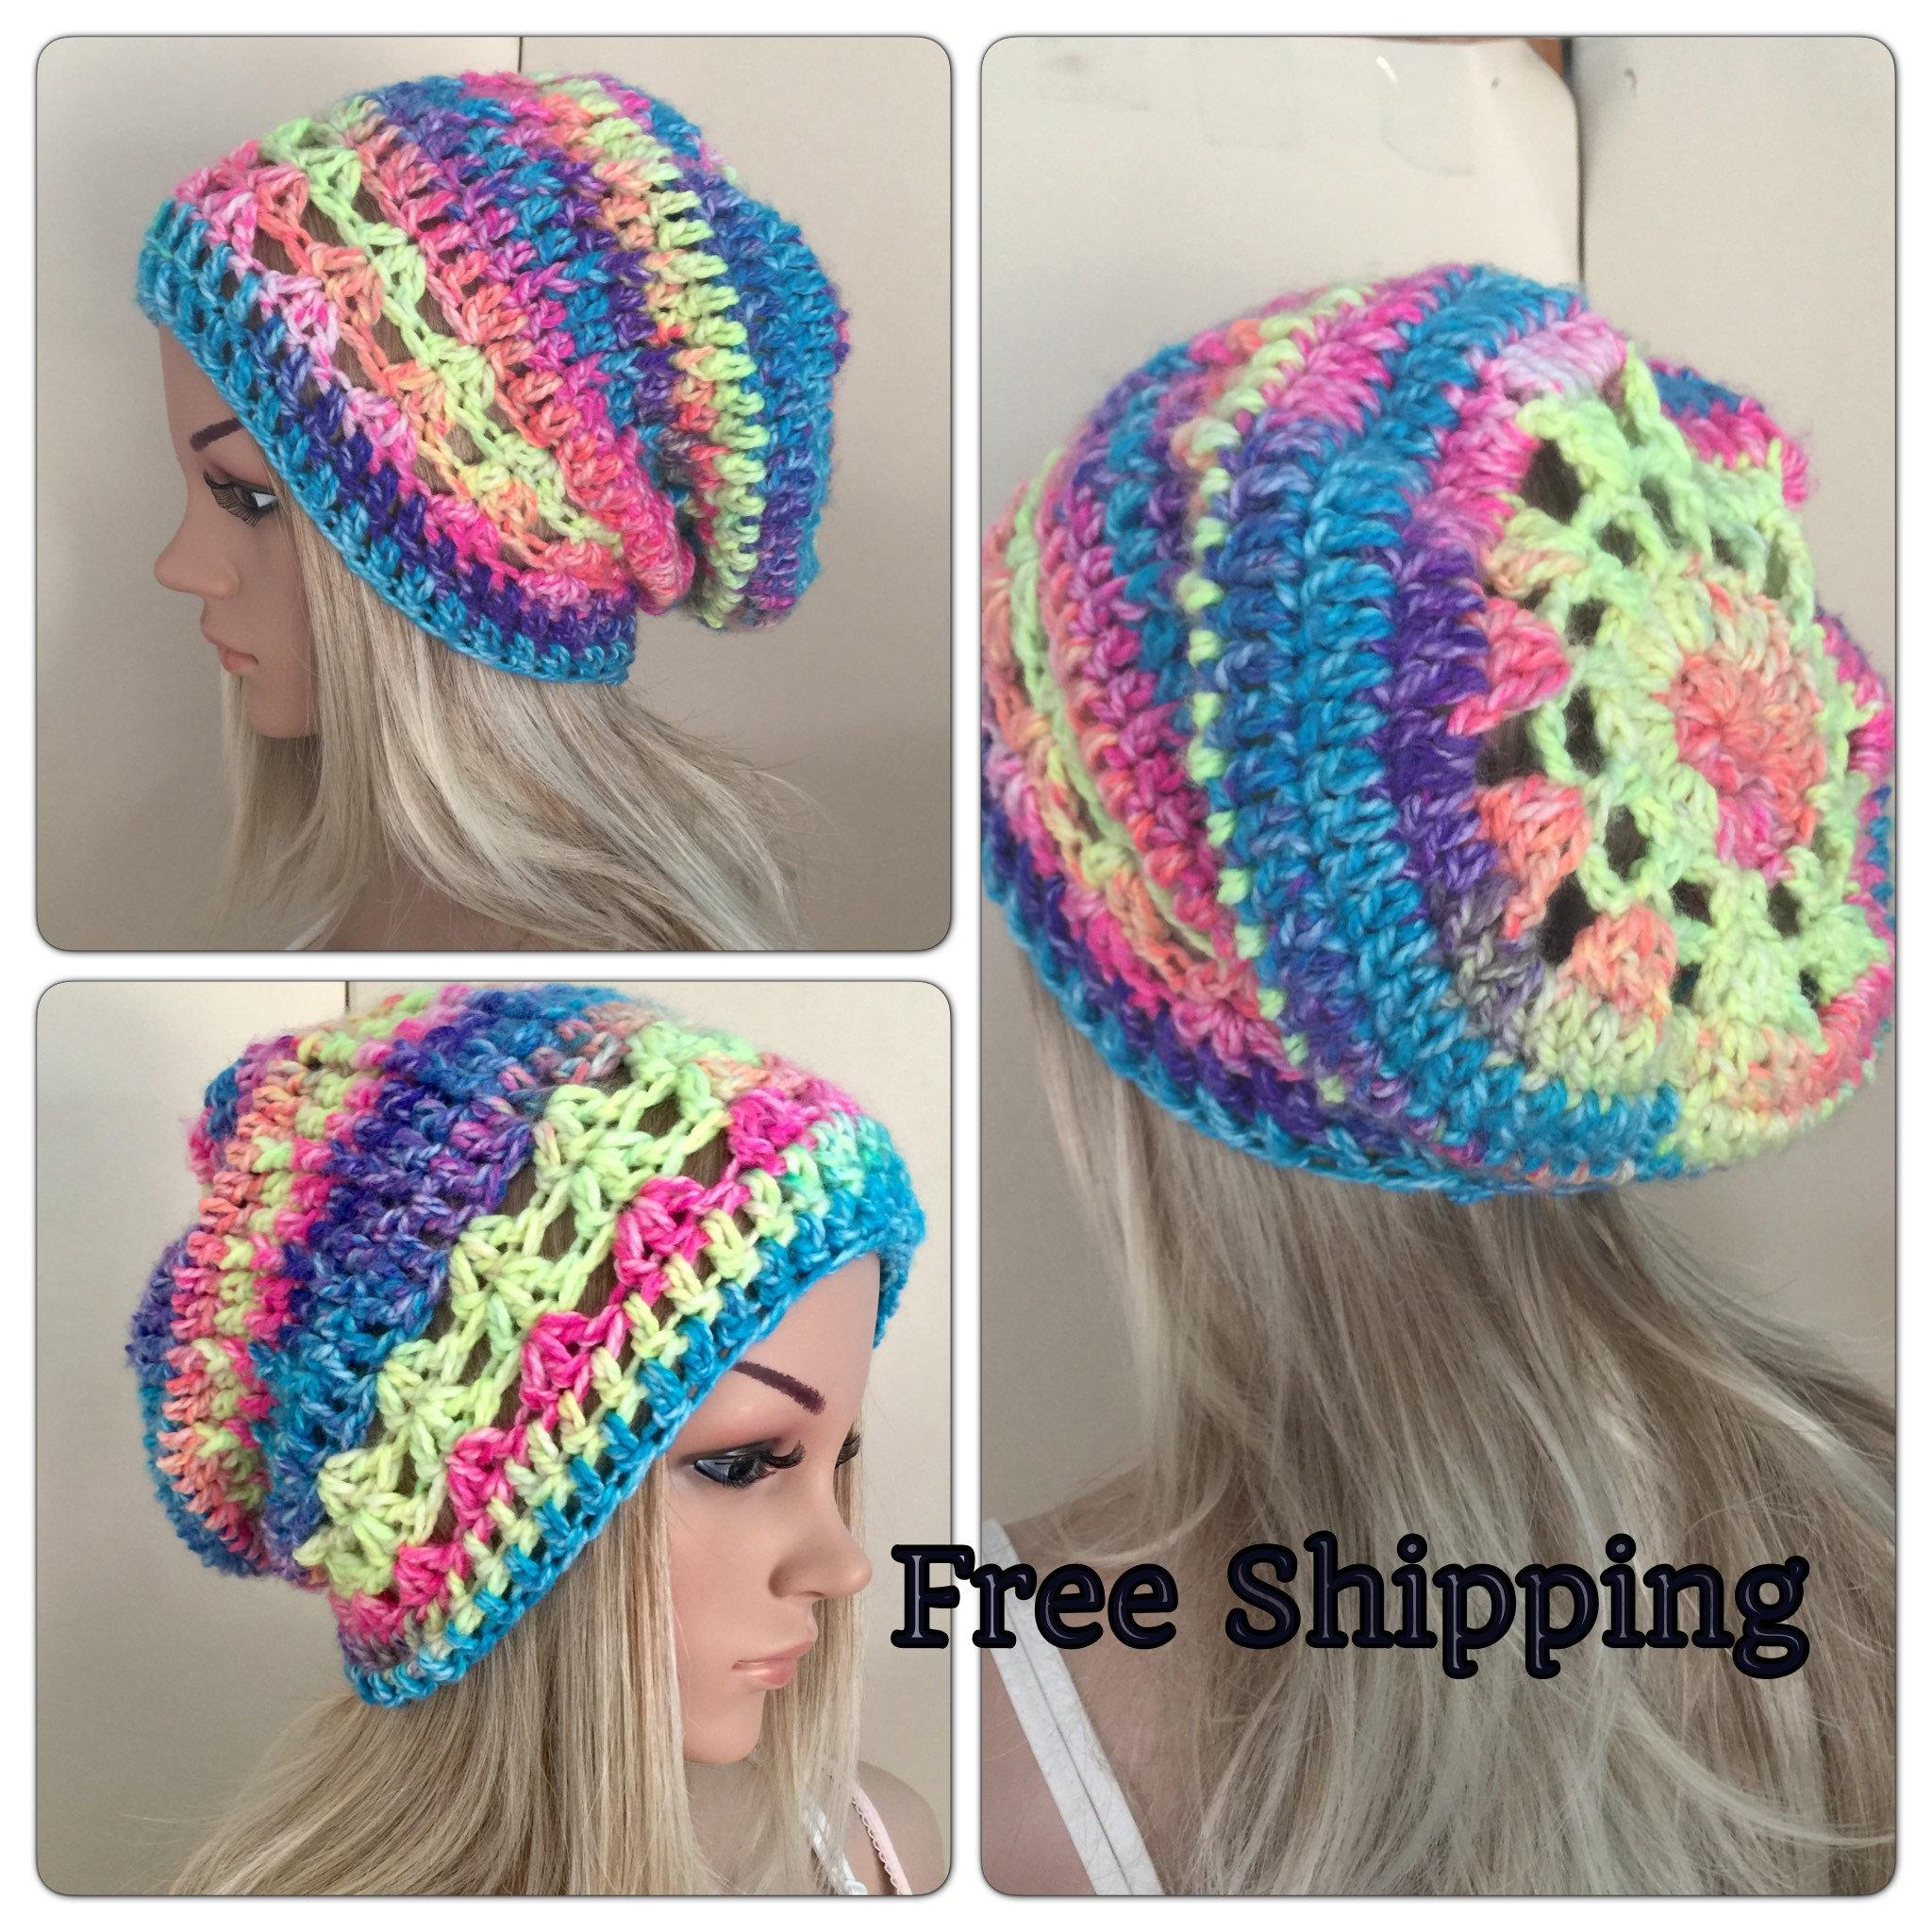 Chunky slouch hat lace Womens hand crochet knit oversized slouchy beanie  snood hat rainbow hippie boho tam teens unique designer mandala 6bcfa532c80